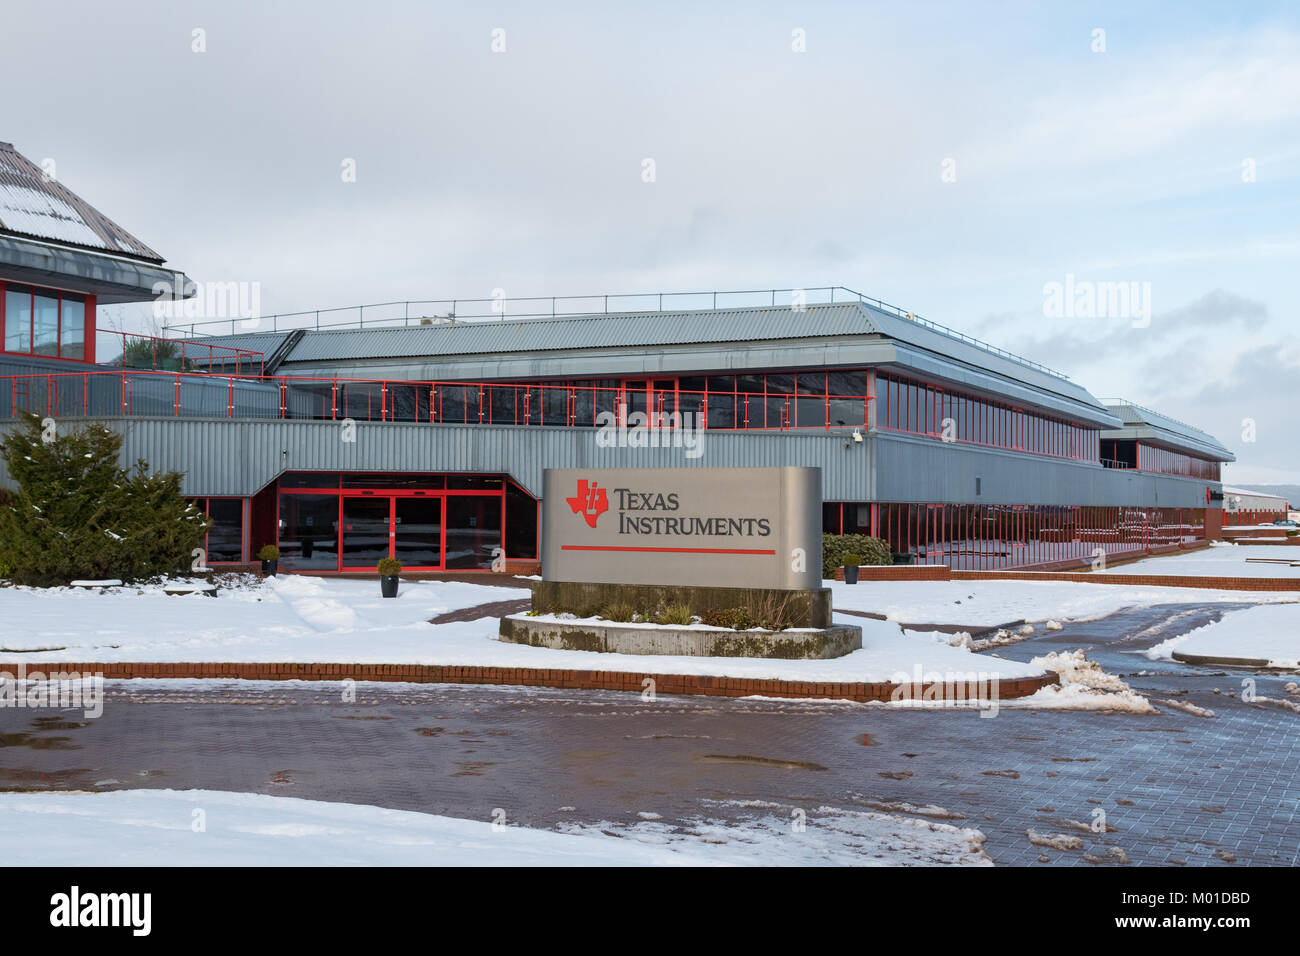 Fábrica de semiconductores texas instruments, Gourock, Greenock, Escocia, Reino Unido Imagen De Stock